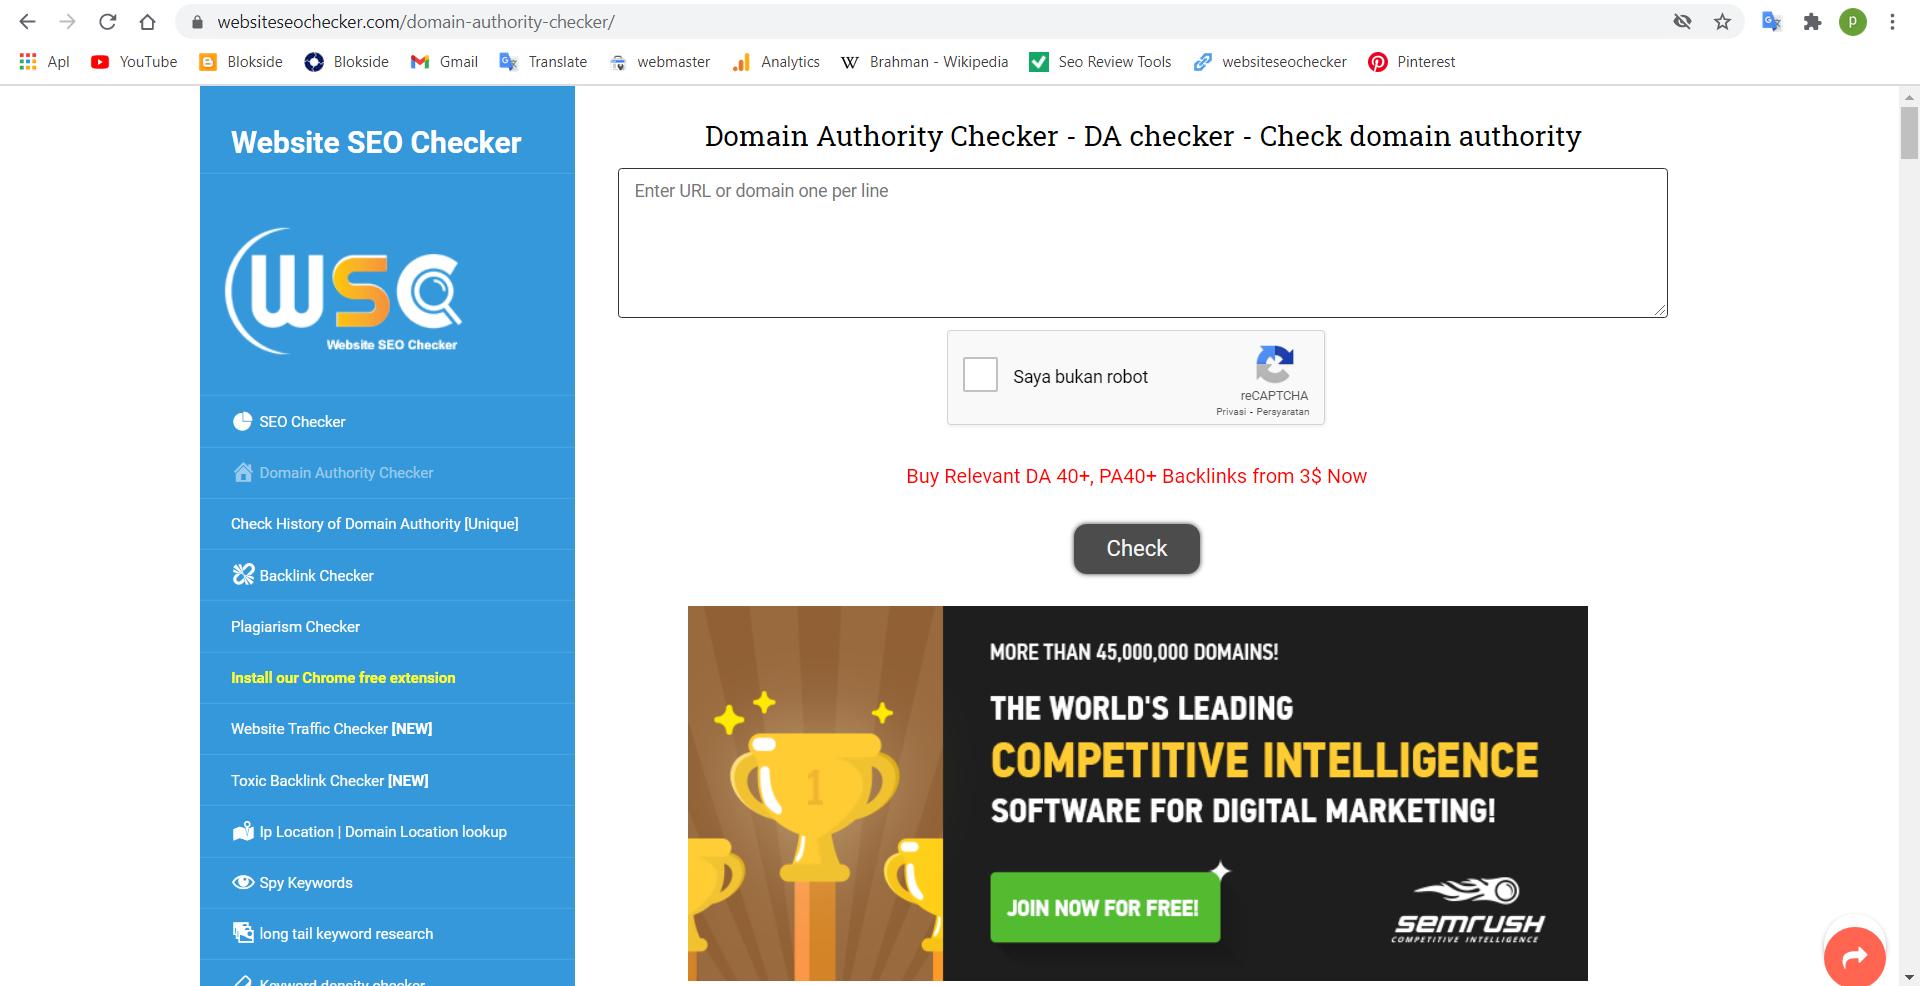 [SEO] list website check domain authority